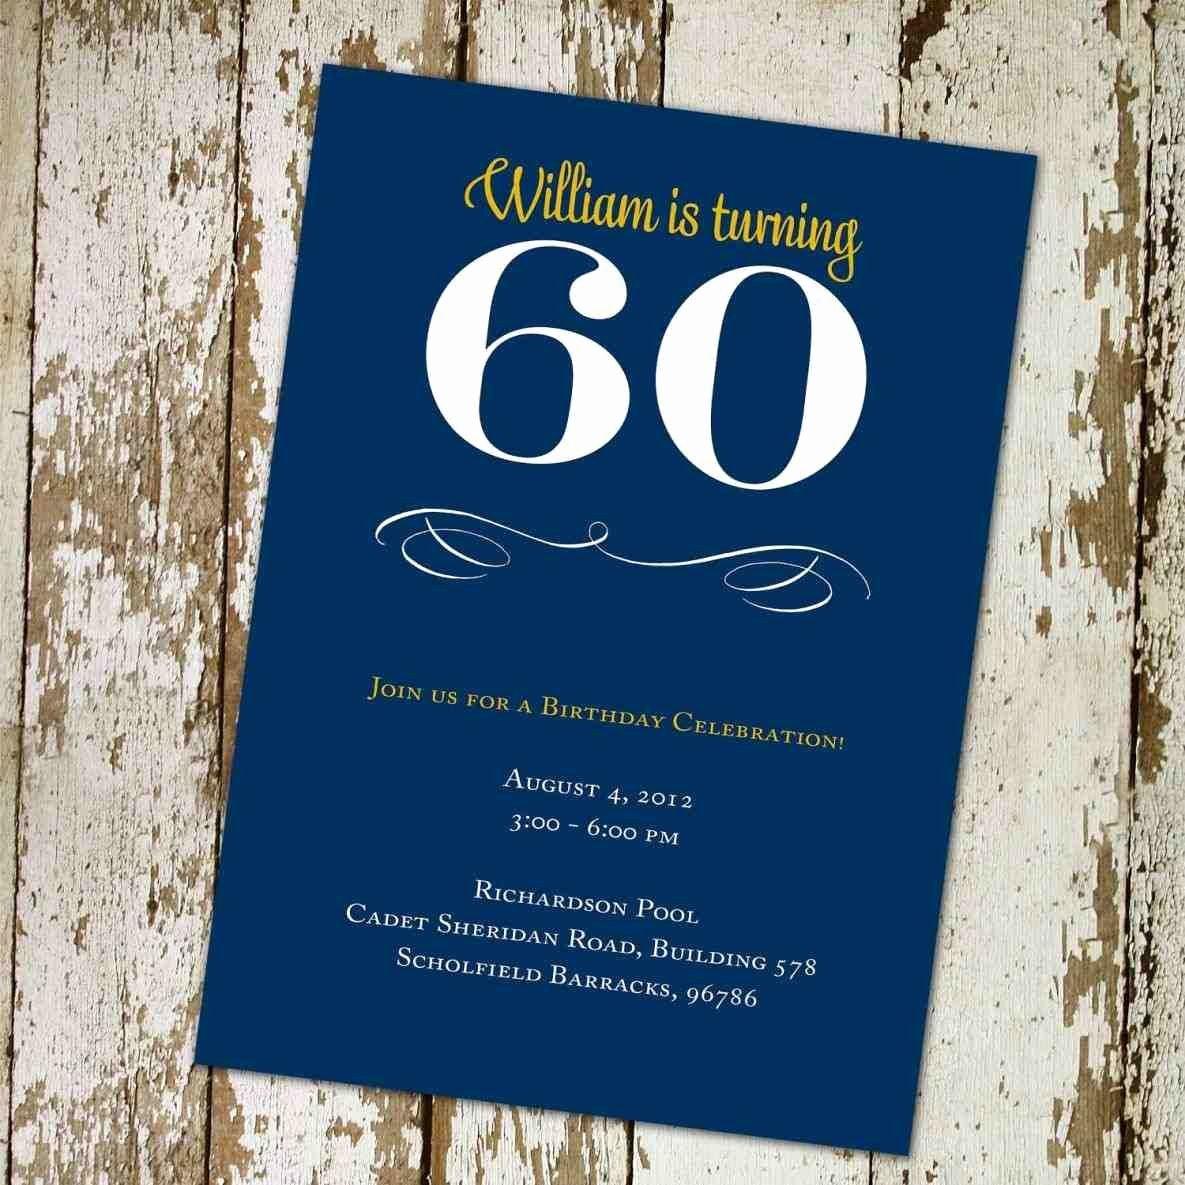 Free 60th Birthday Invitations Templates Elegant Full Size Of Template 30th Birthday Invitations Templates